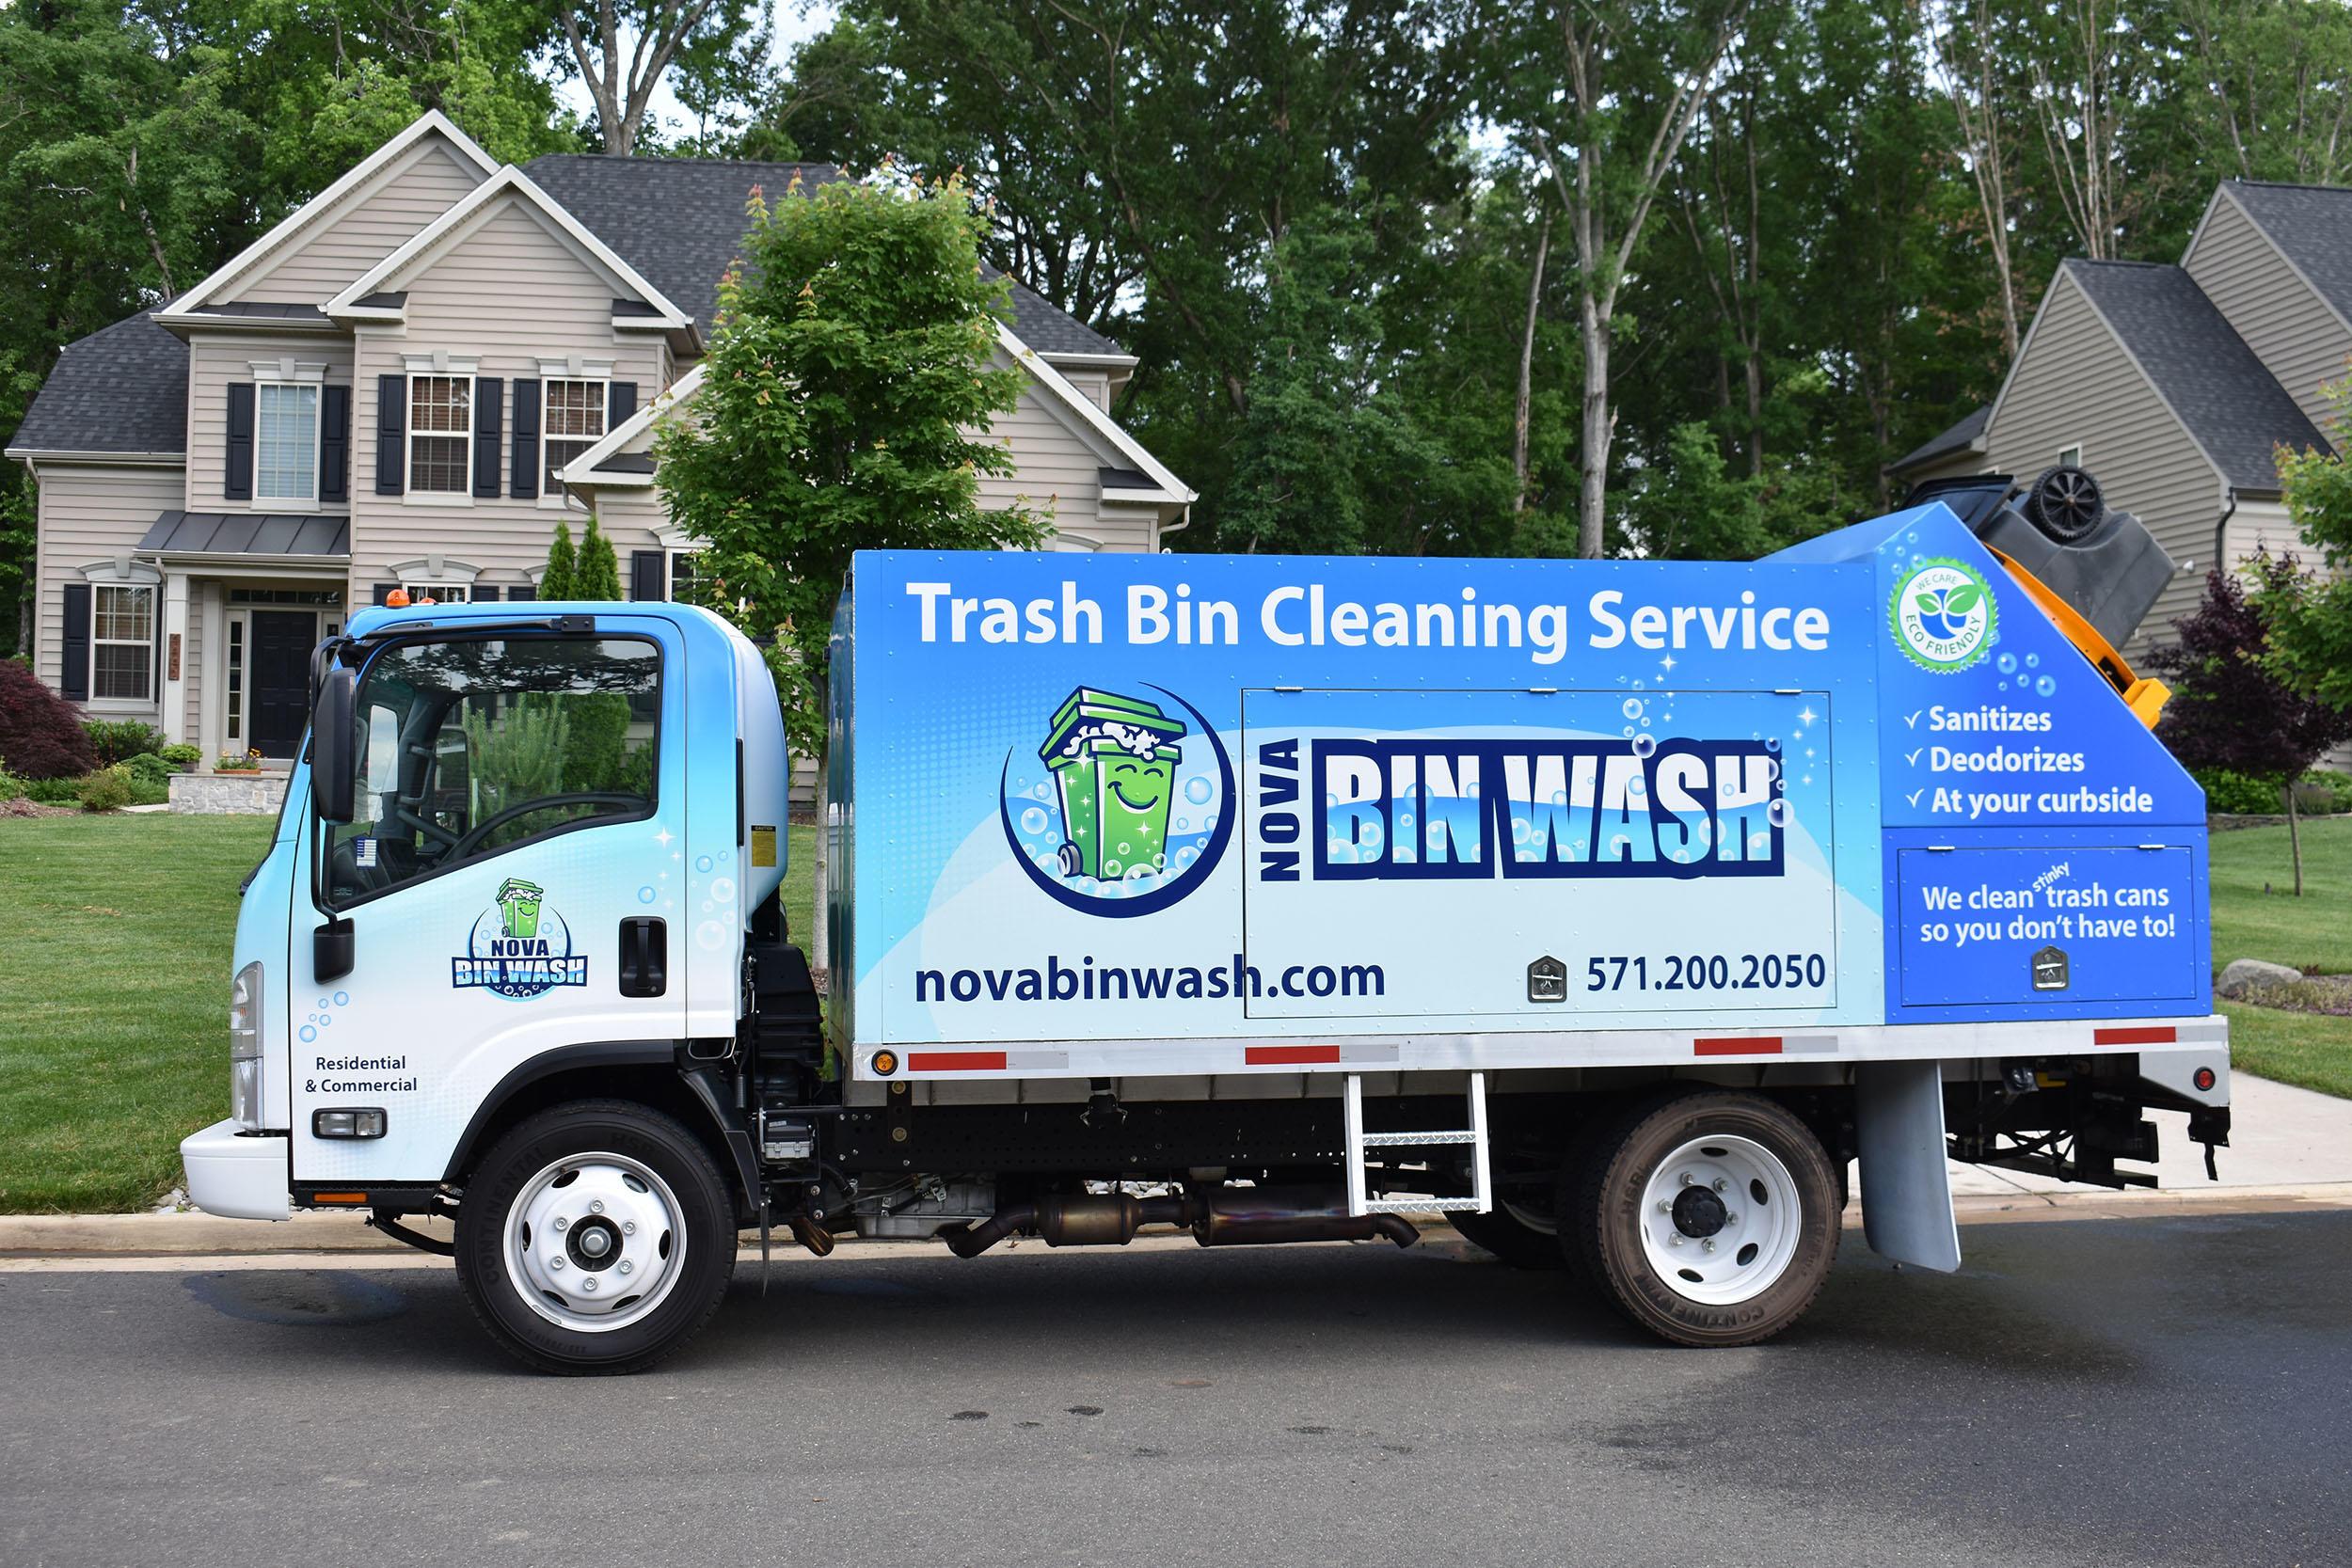 Nova Bin Wash image 5